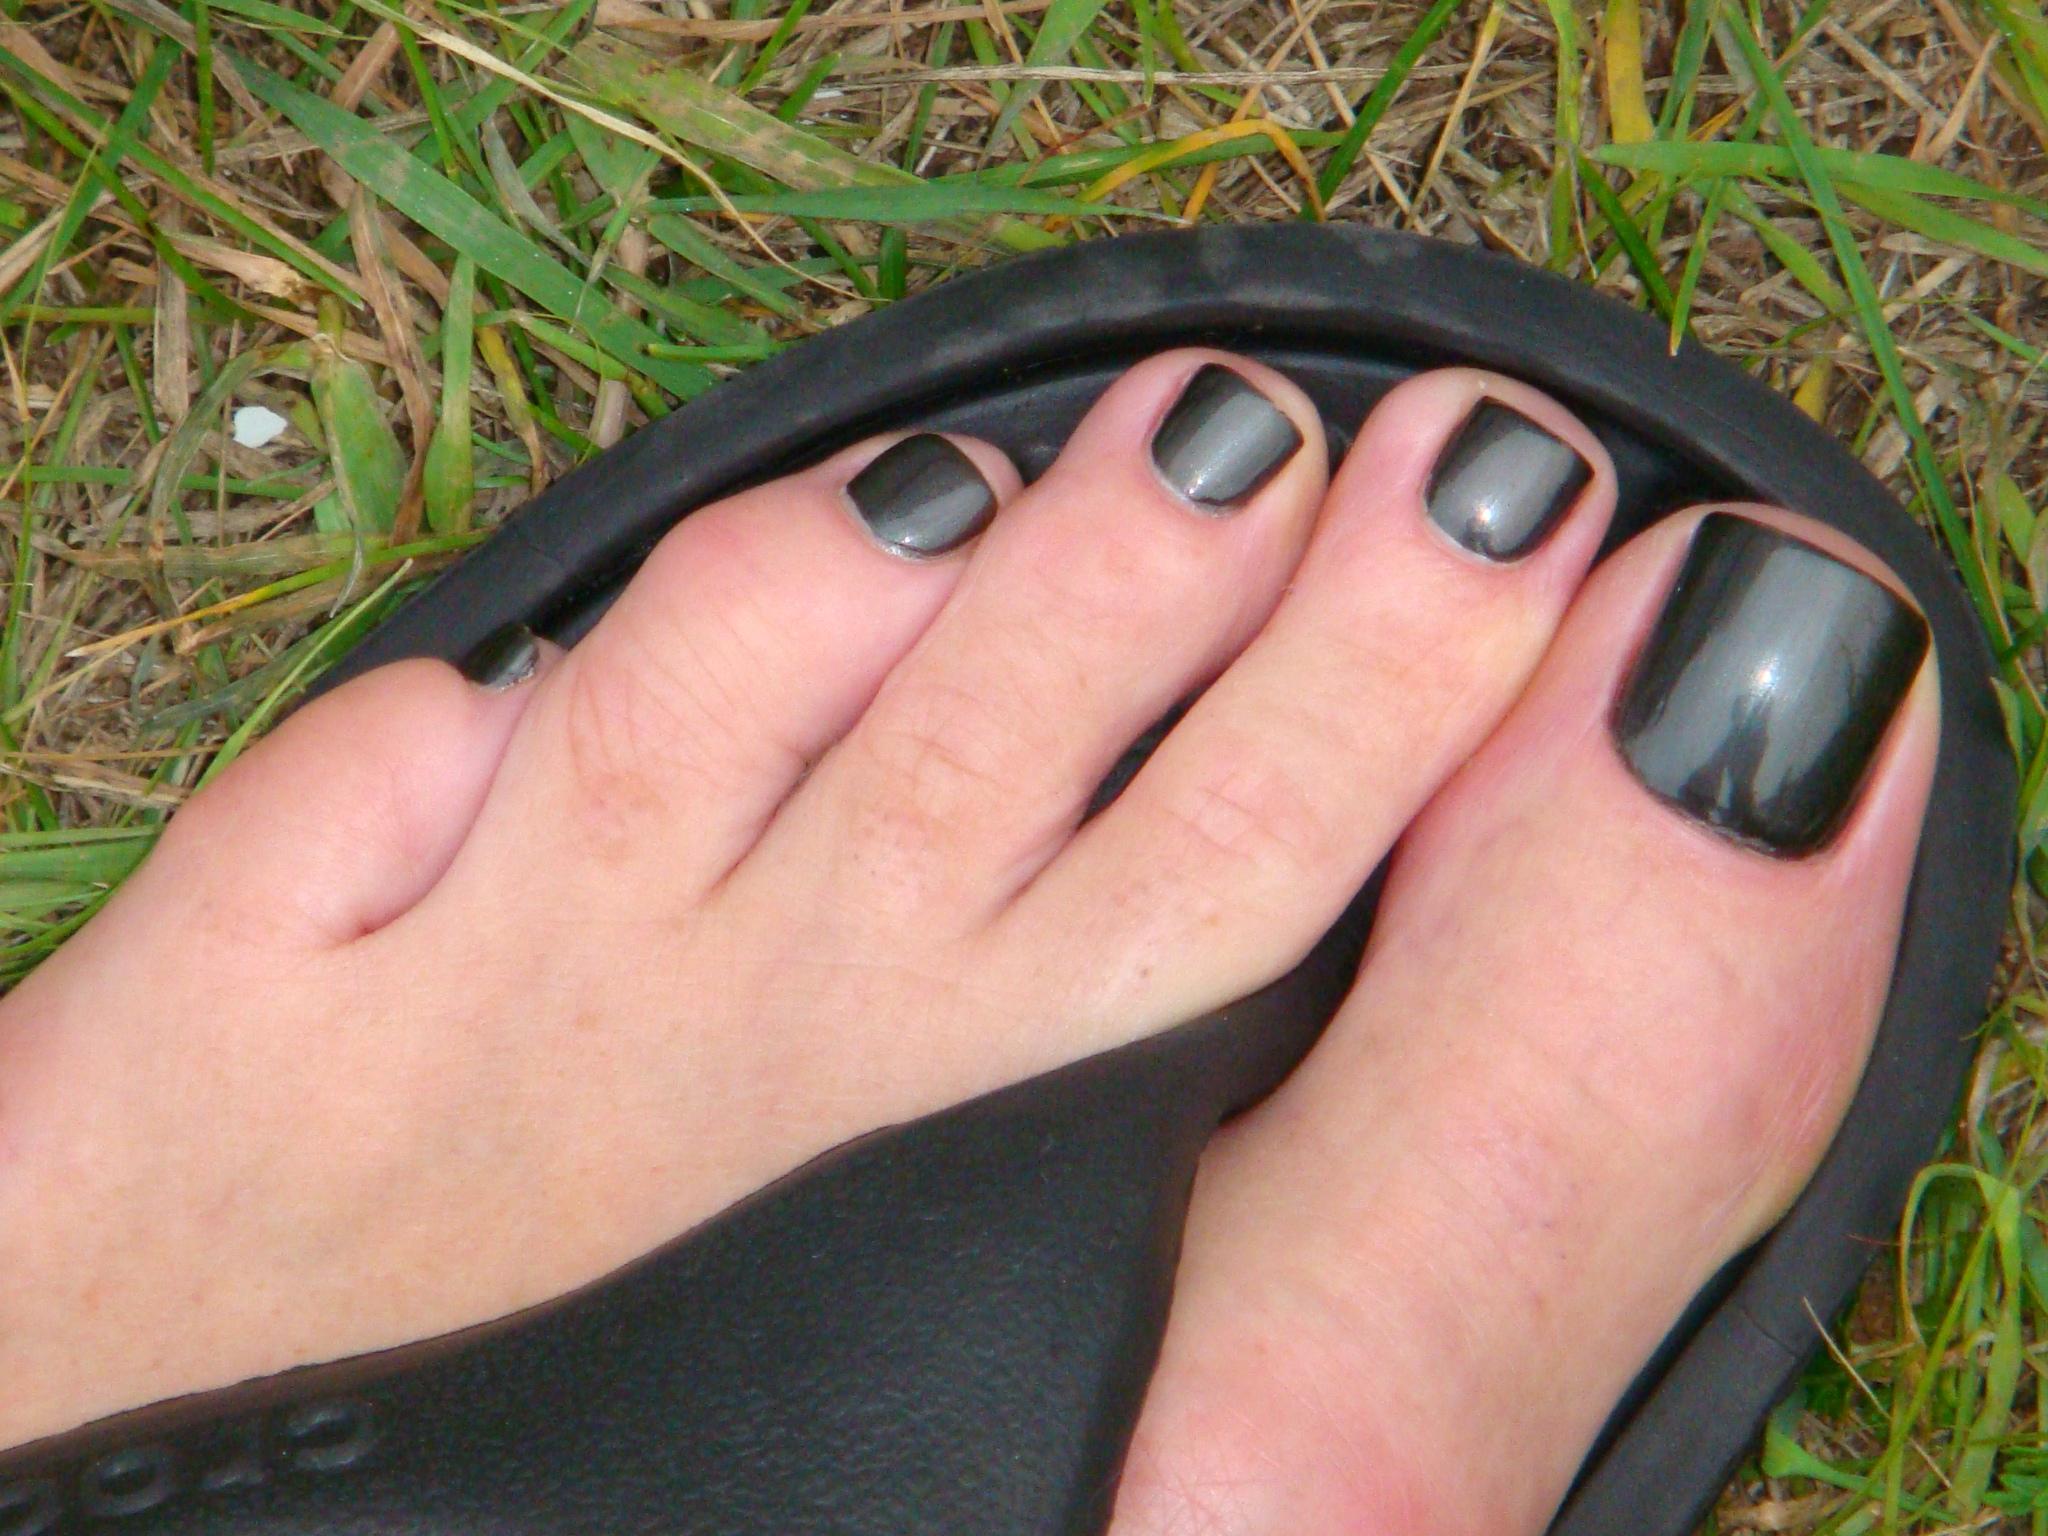 File:Toe nails black.jpg - Wikimedia Commons